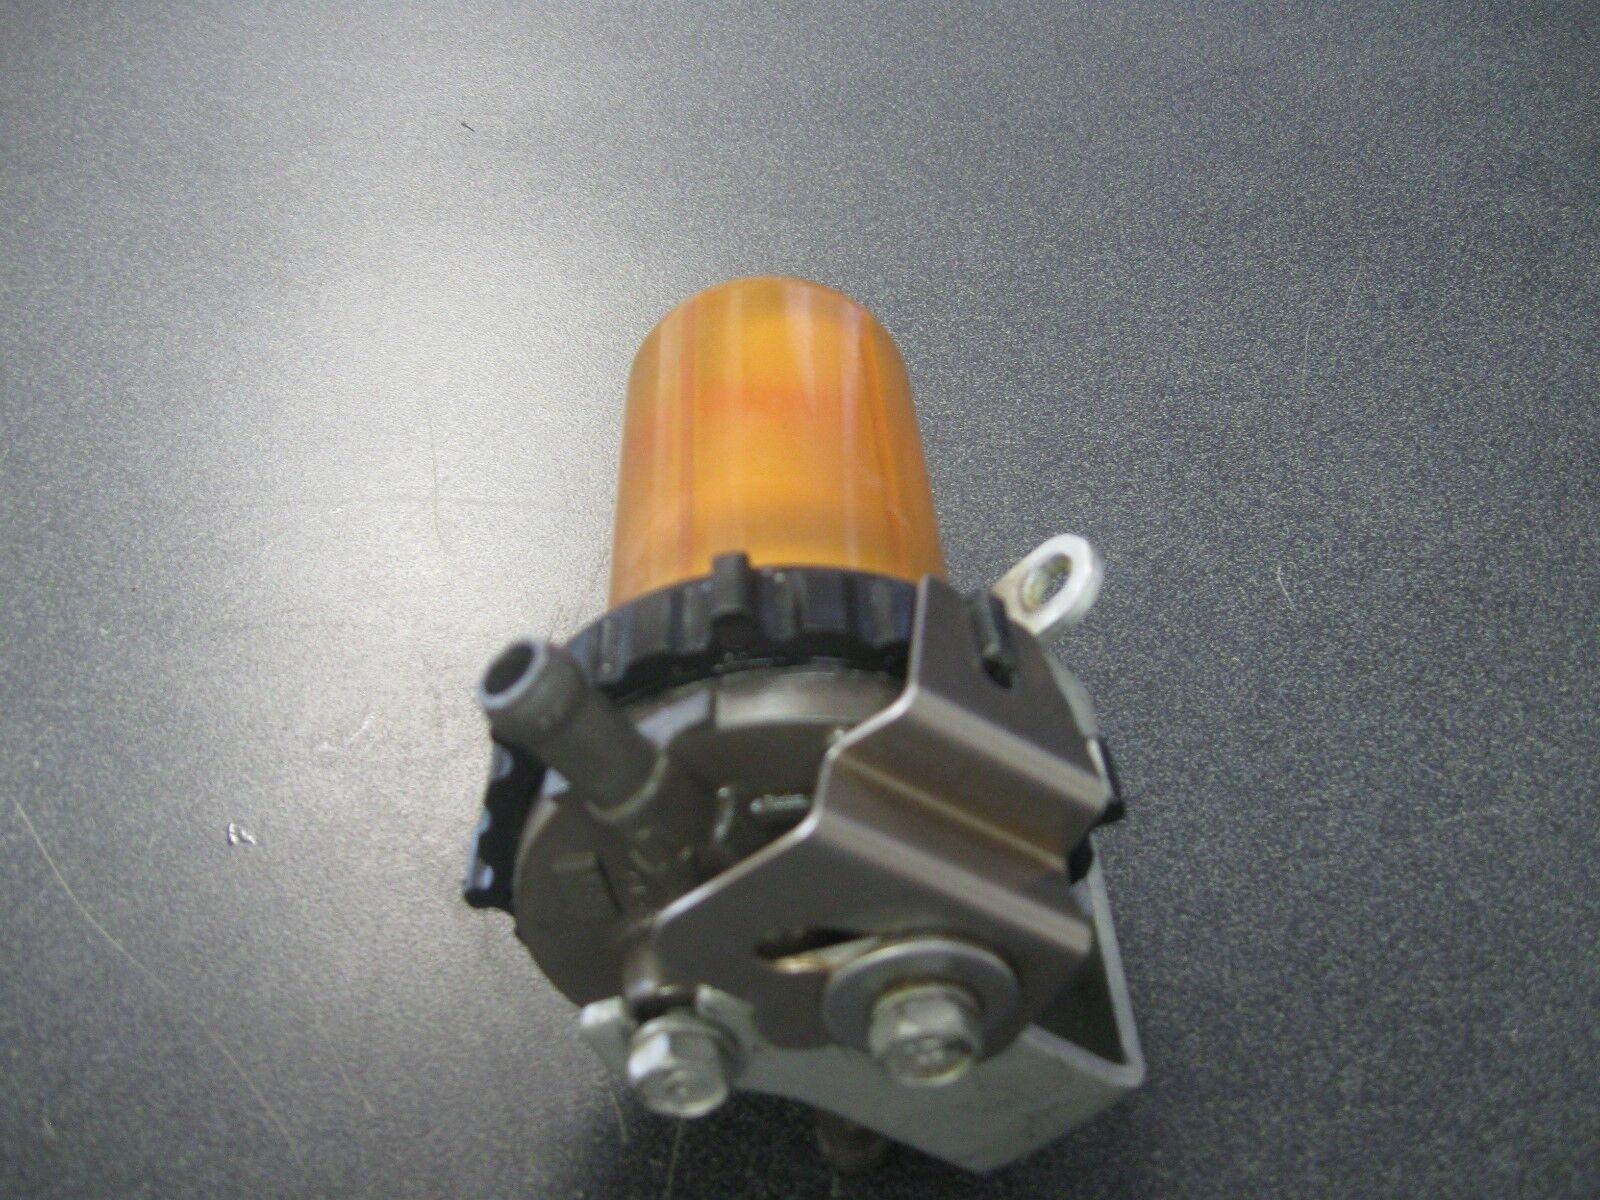 Yamaha Filter Assy Assy Assy 65L 24560 00 00 mit Halterung